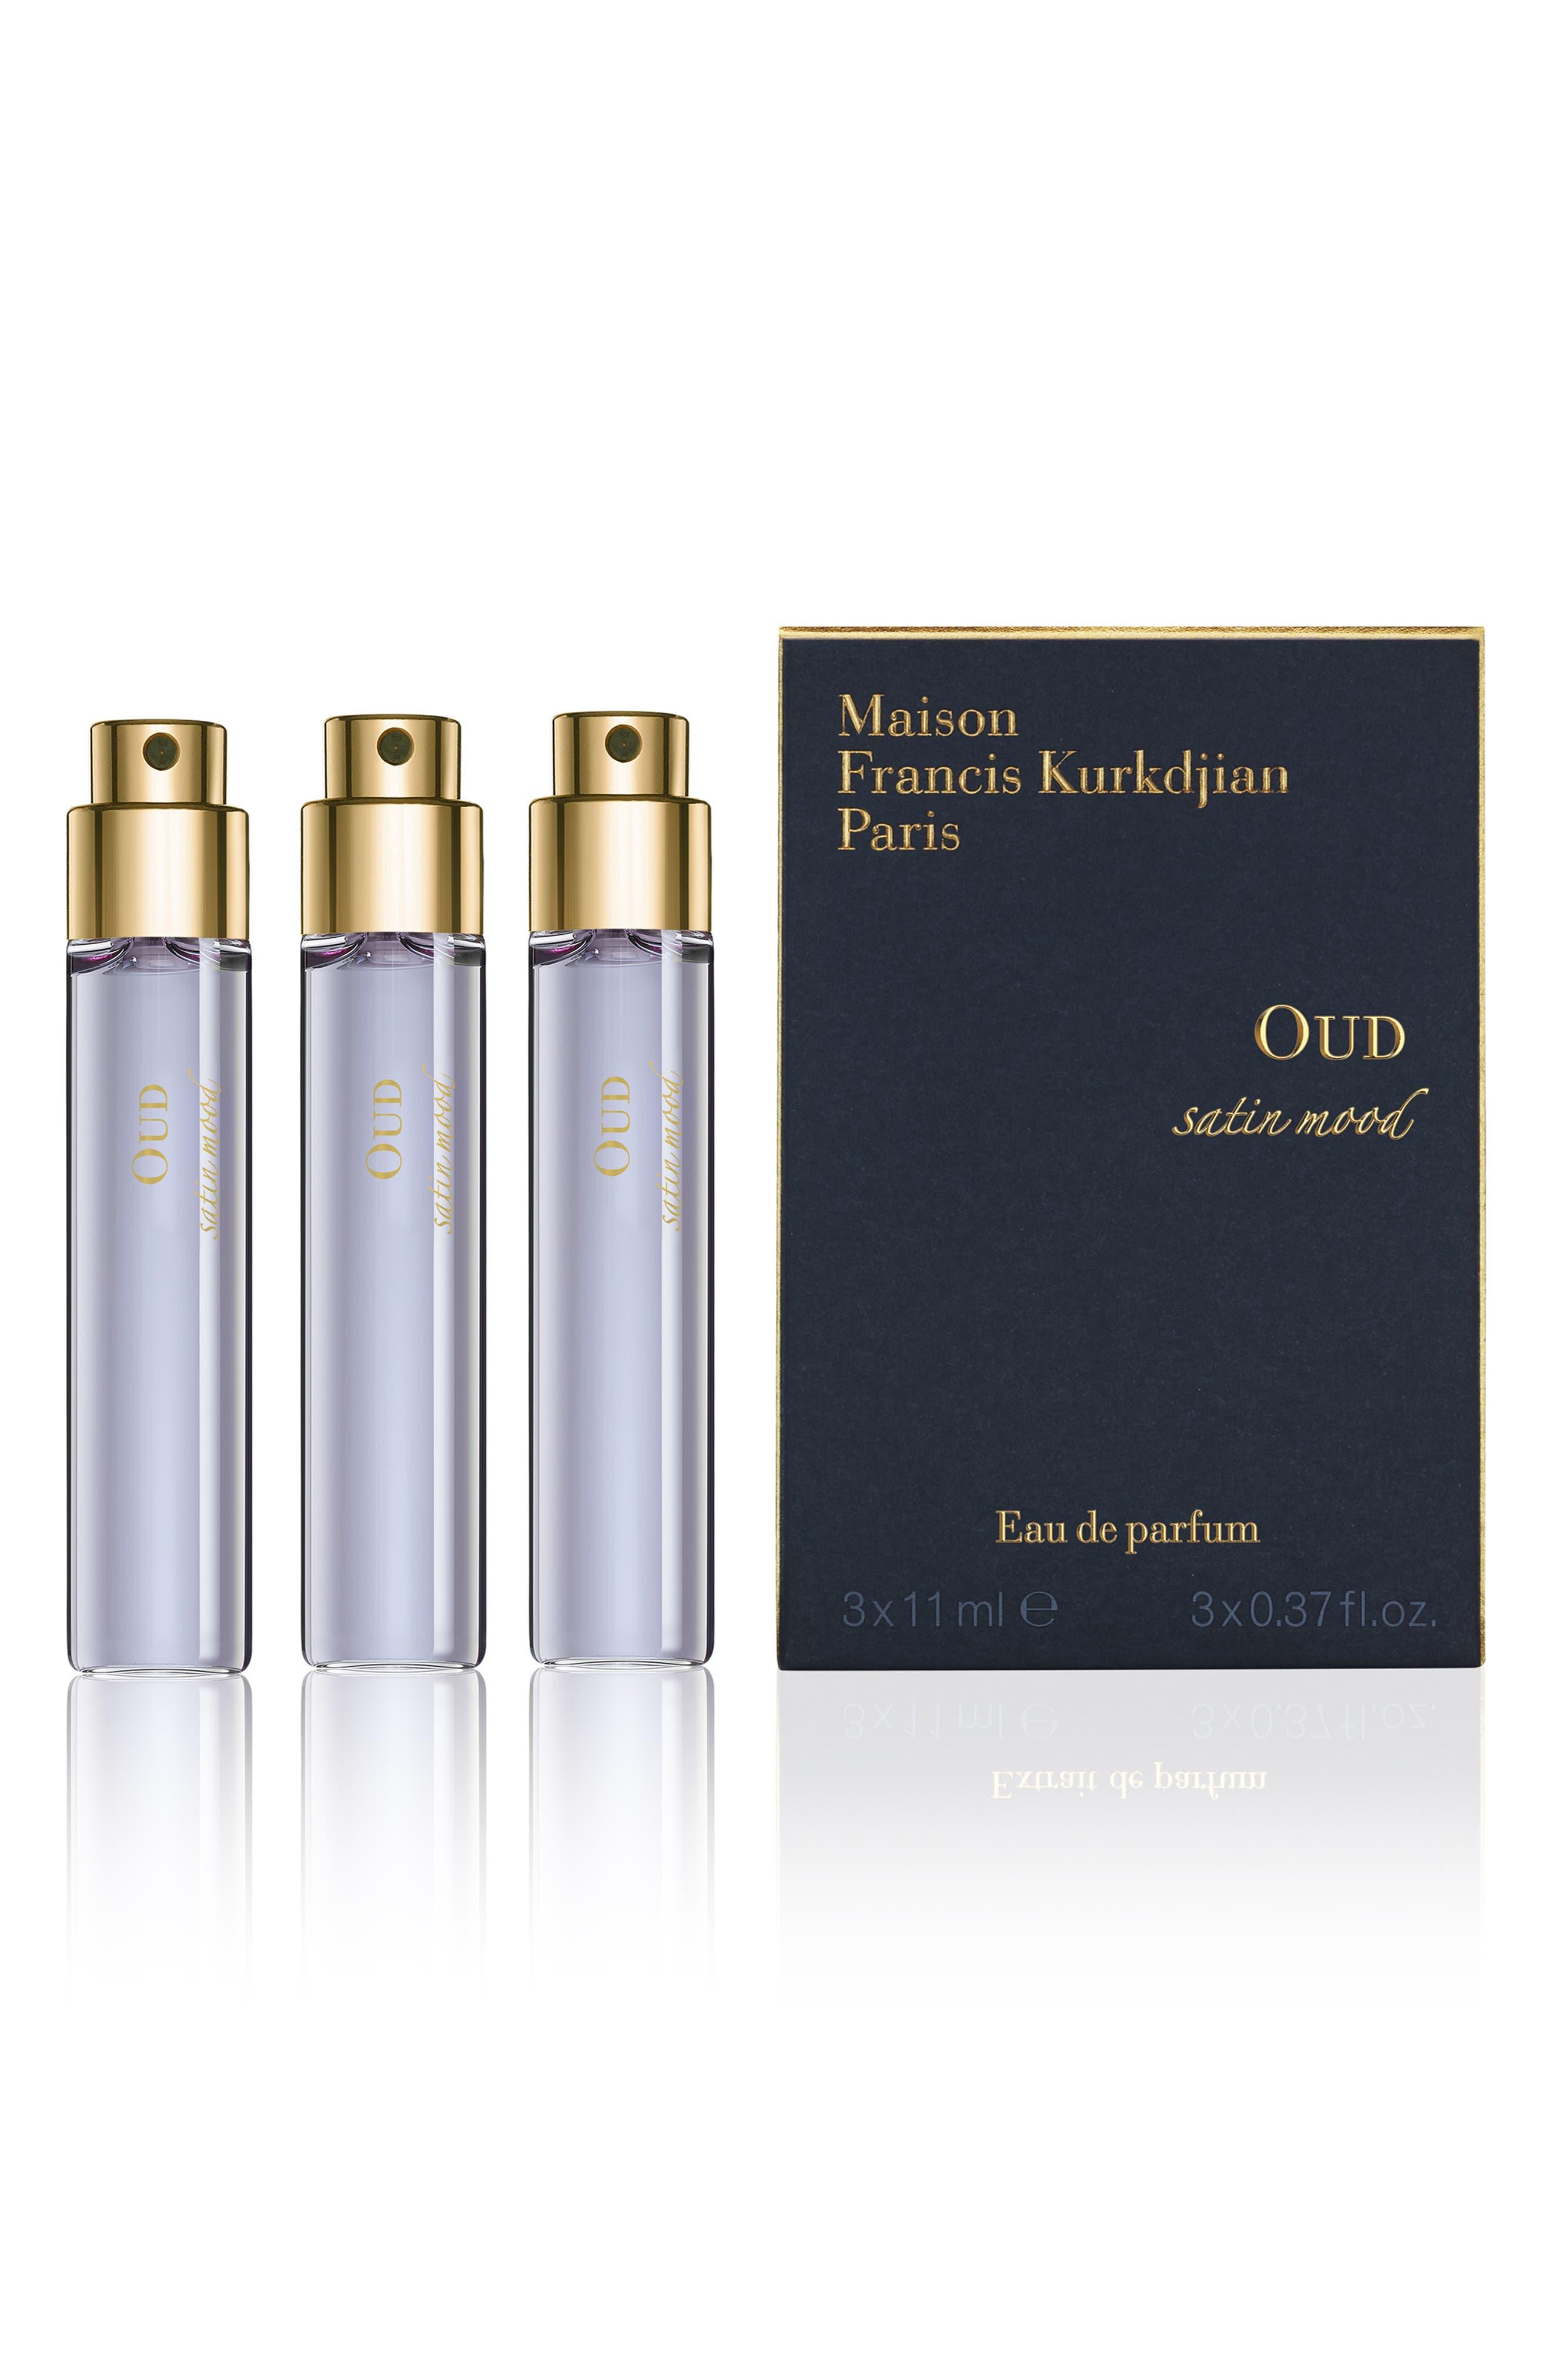 Paris Oud Satin Mood Eau De Parfum Travel Spray Trio